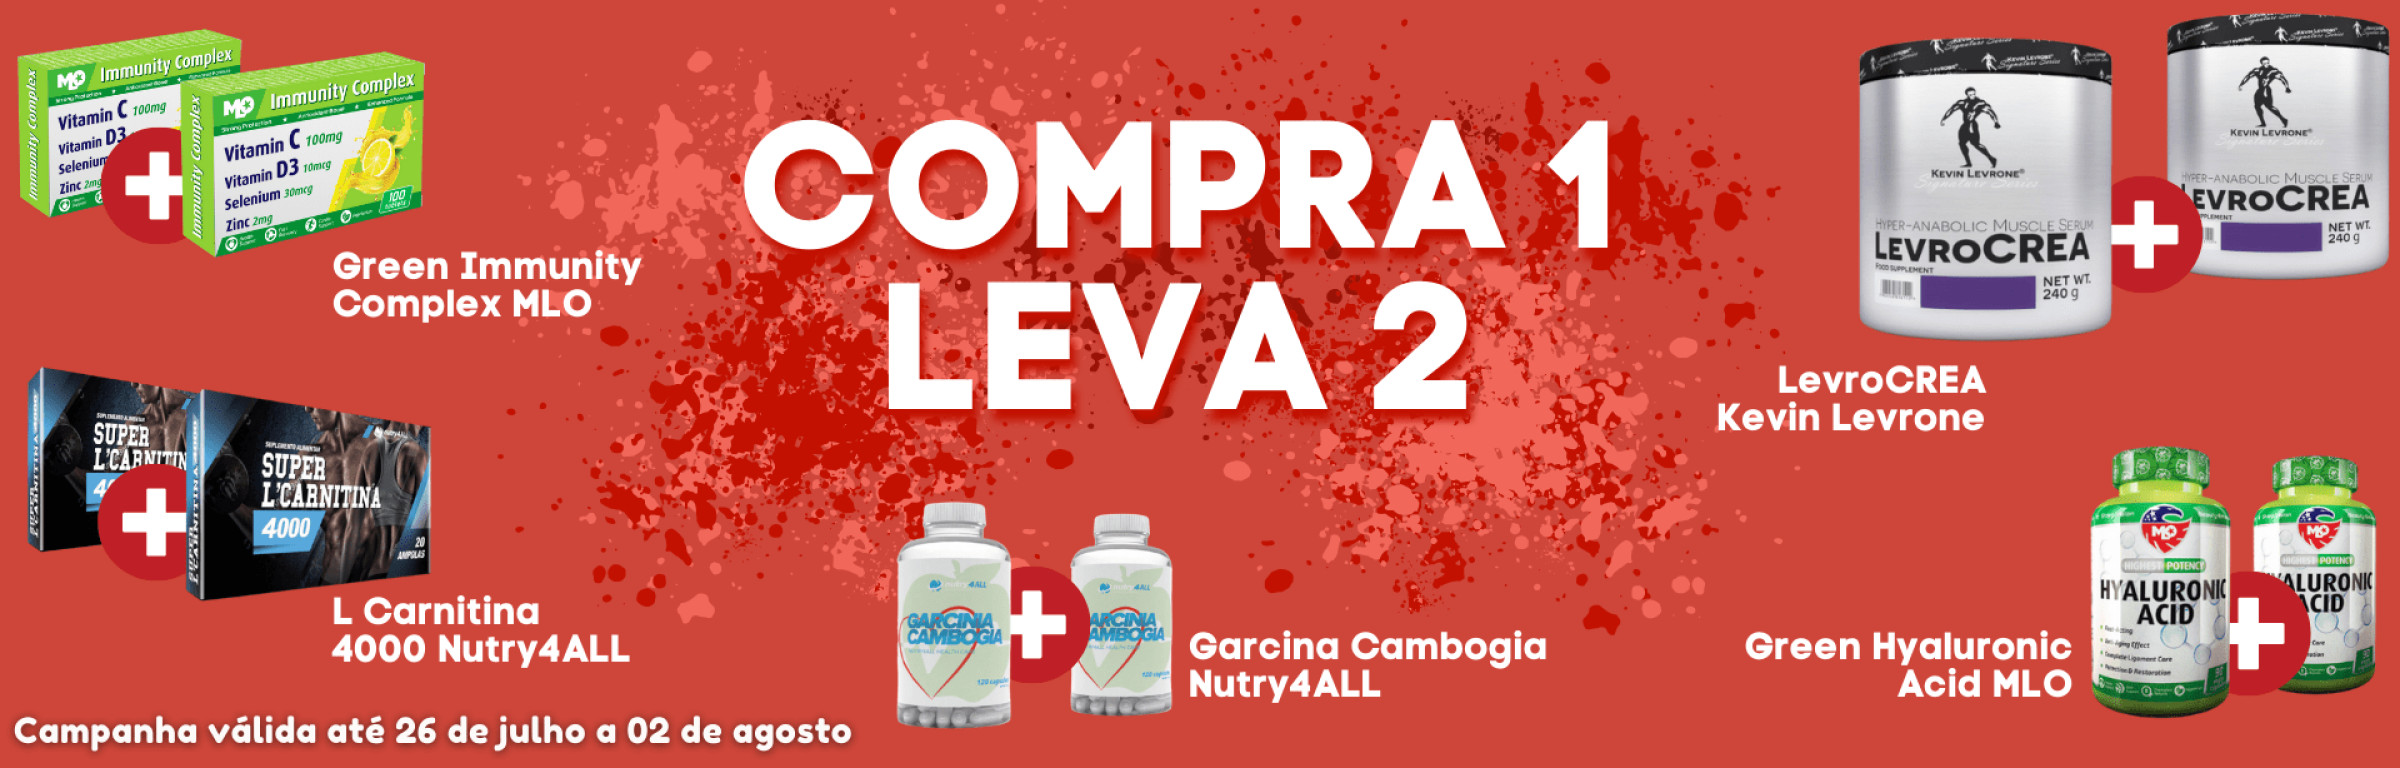 Compra 1 Leva 2 - Nos produtos Green imunity complex MLO, Garcinia Camboja nutry4ALL, L Carnitina 4000 nutry4ALL, Green Hyaluronic Acid MLO, LevroCREA Kevin Levrone